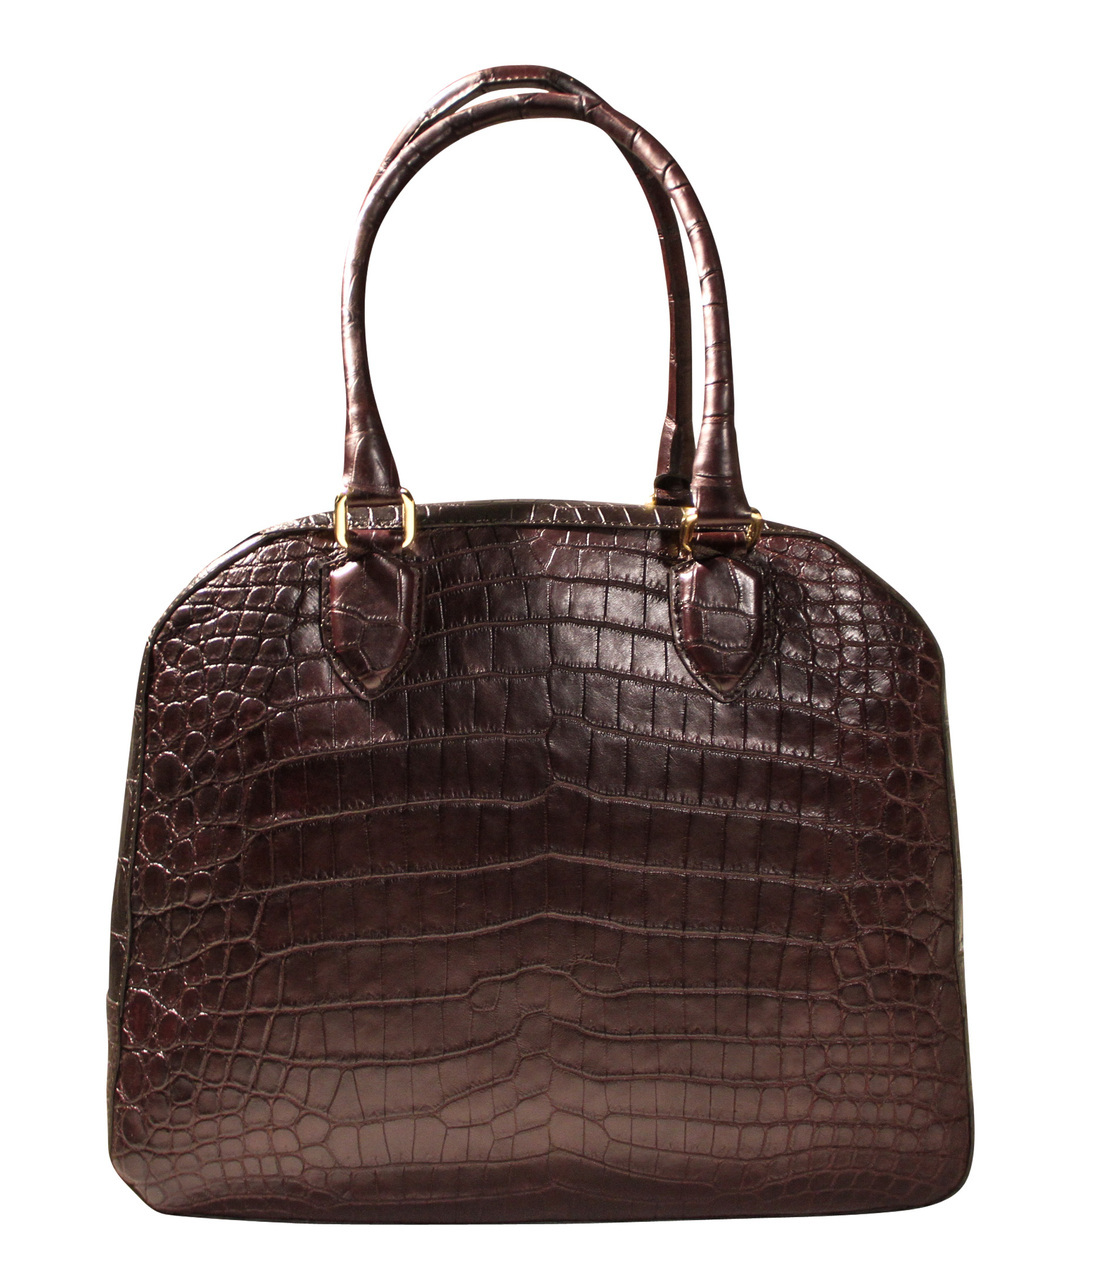 Wide Body Bowling Bag - Dark Brown Crocodile